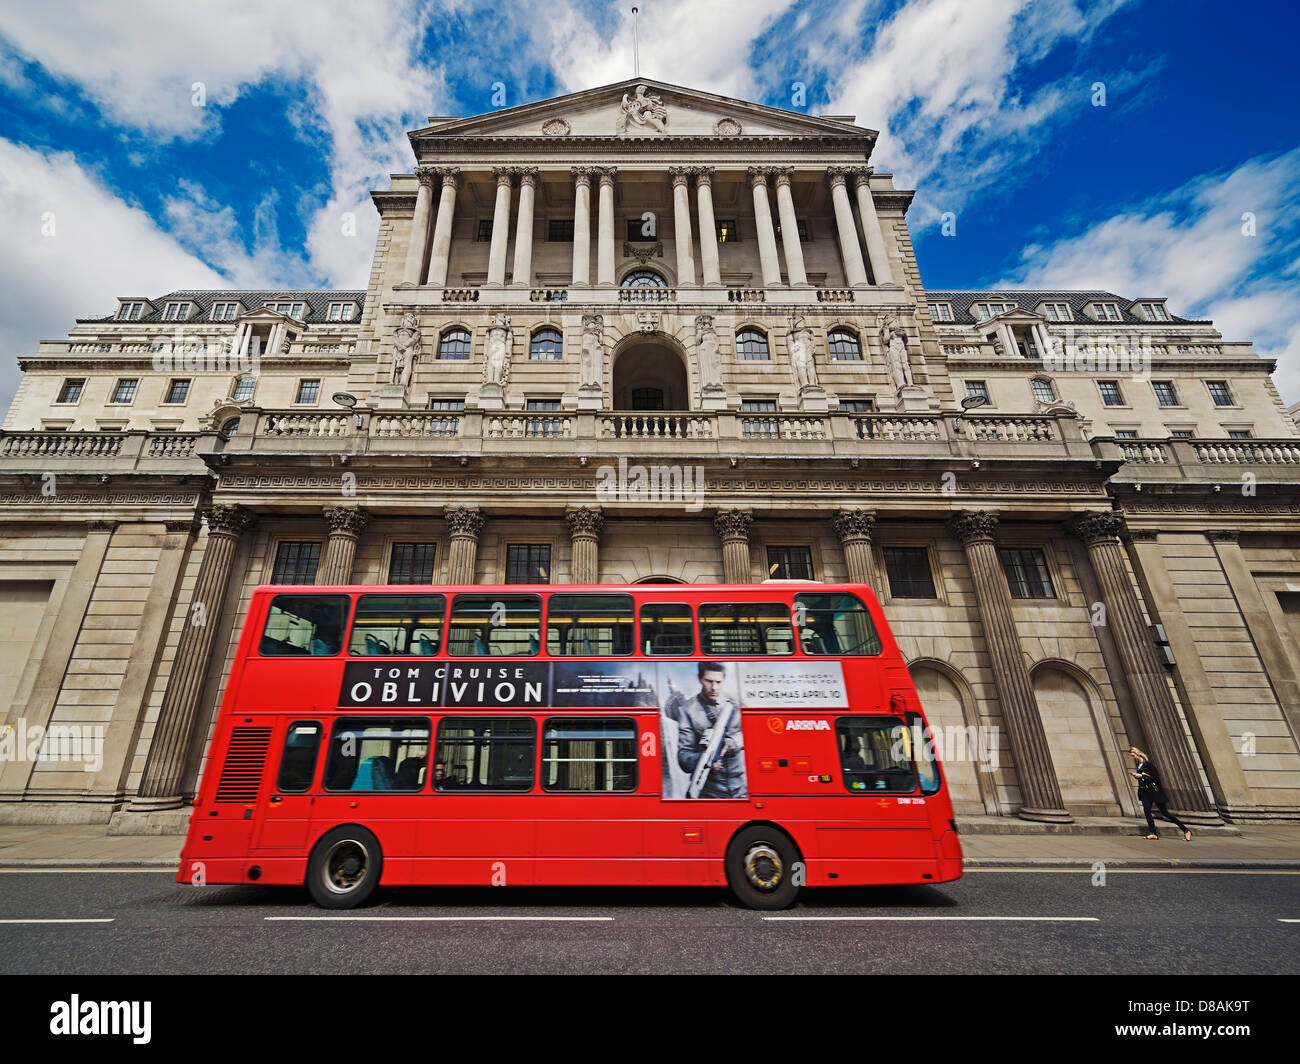 The Bank of England, Threadneedle Street, London, England, United Kingdom. - Stock Image